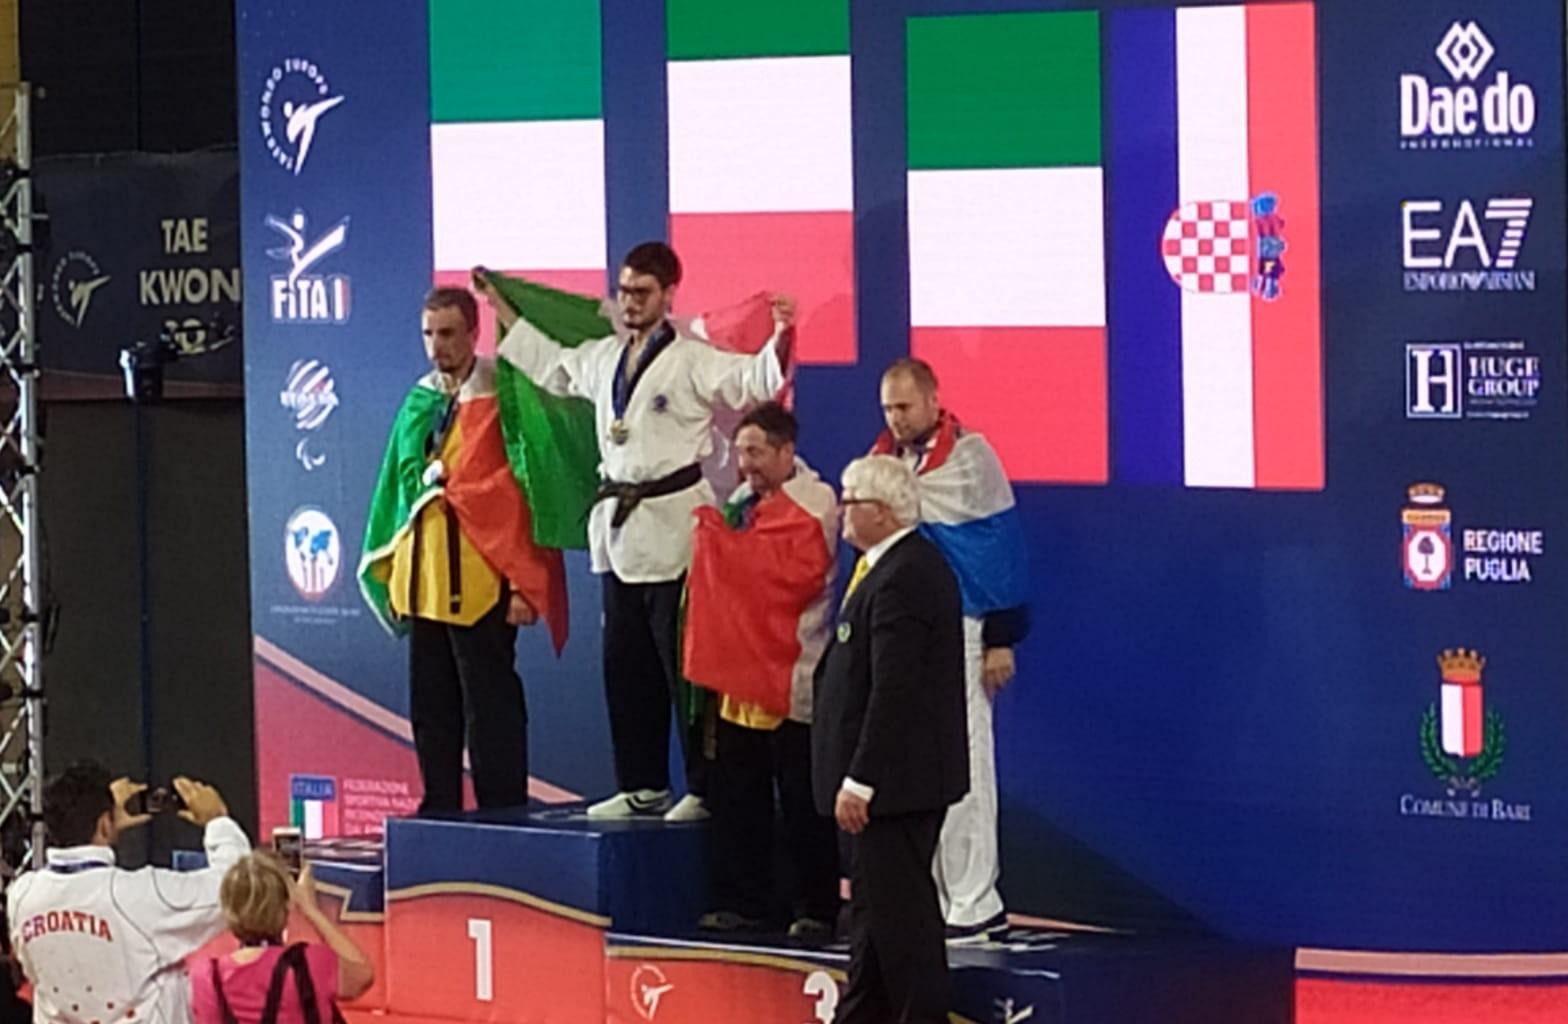 Campionati europei Parataekwondo